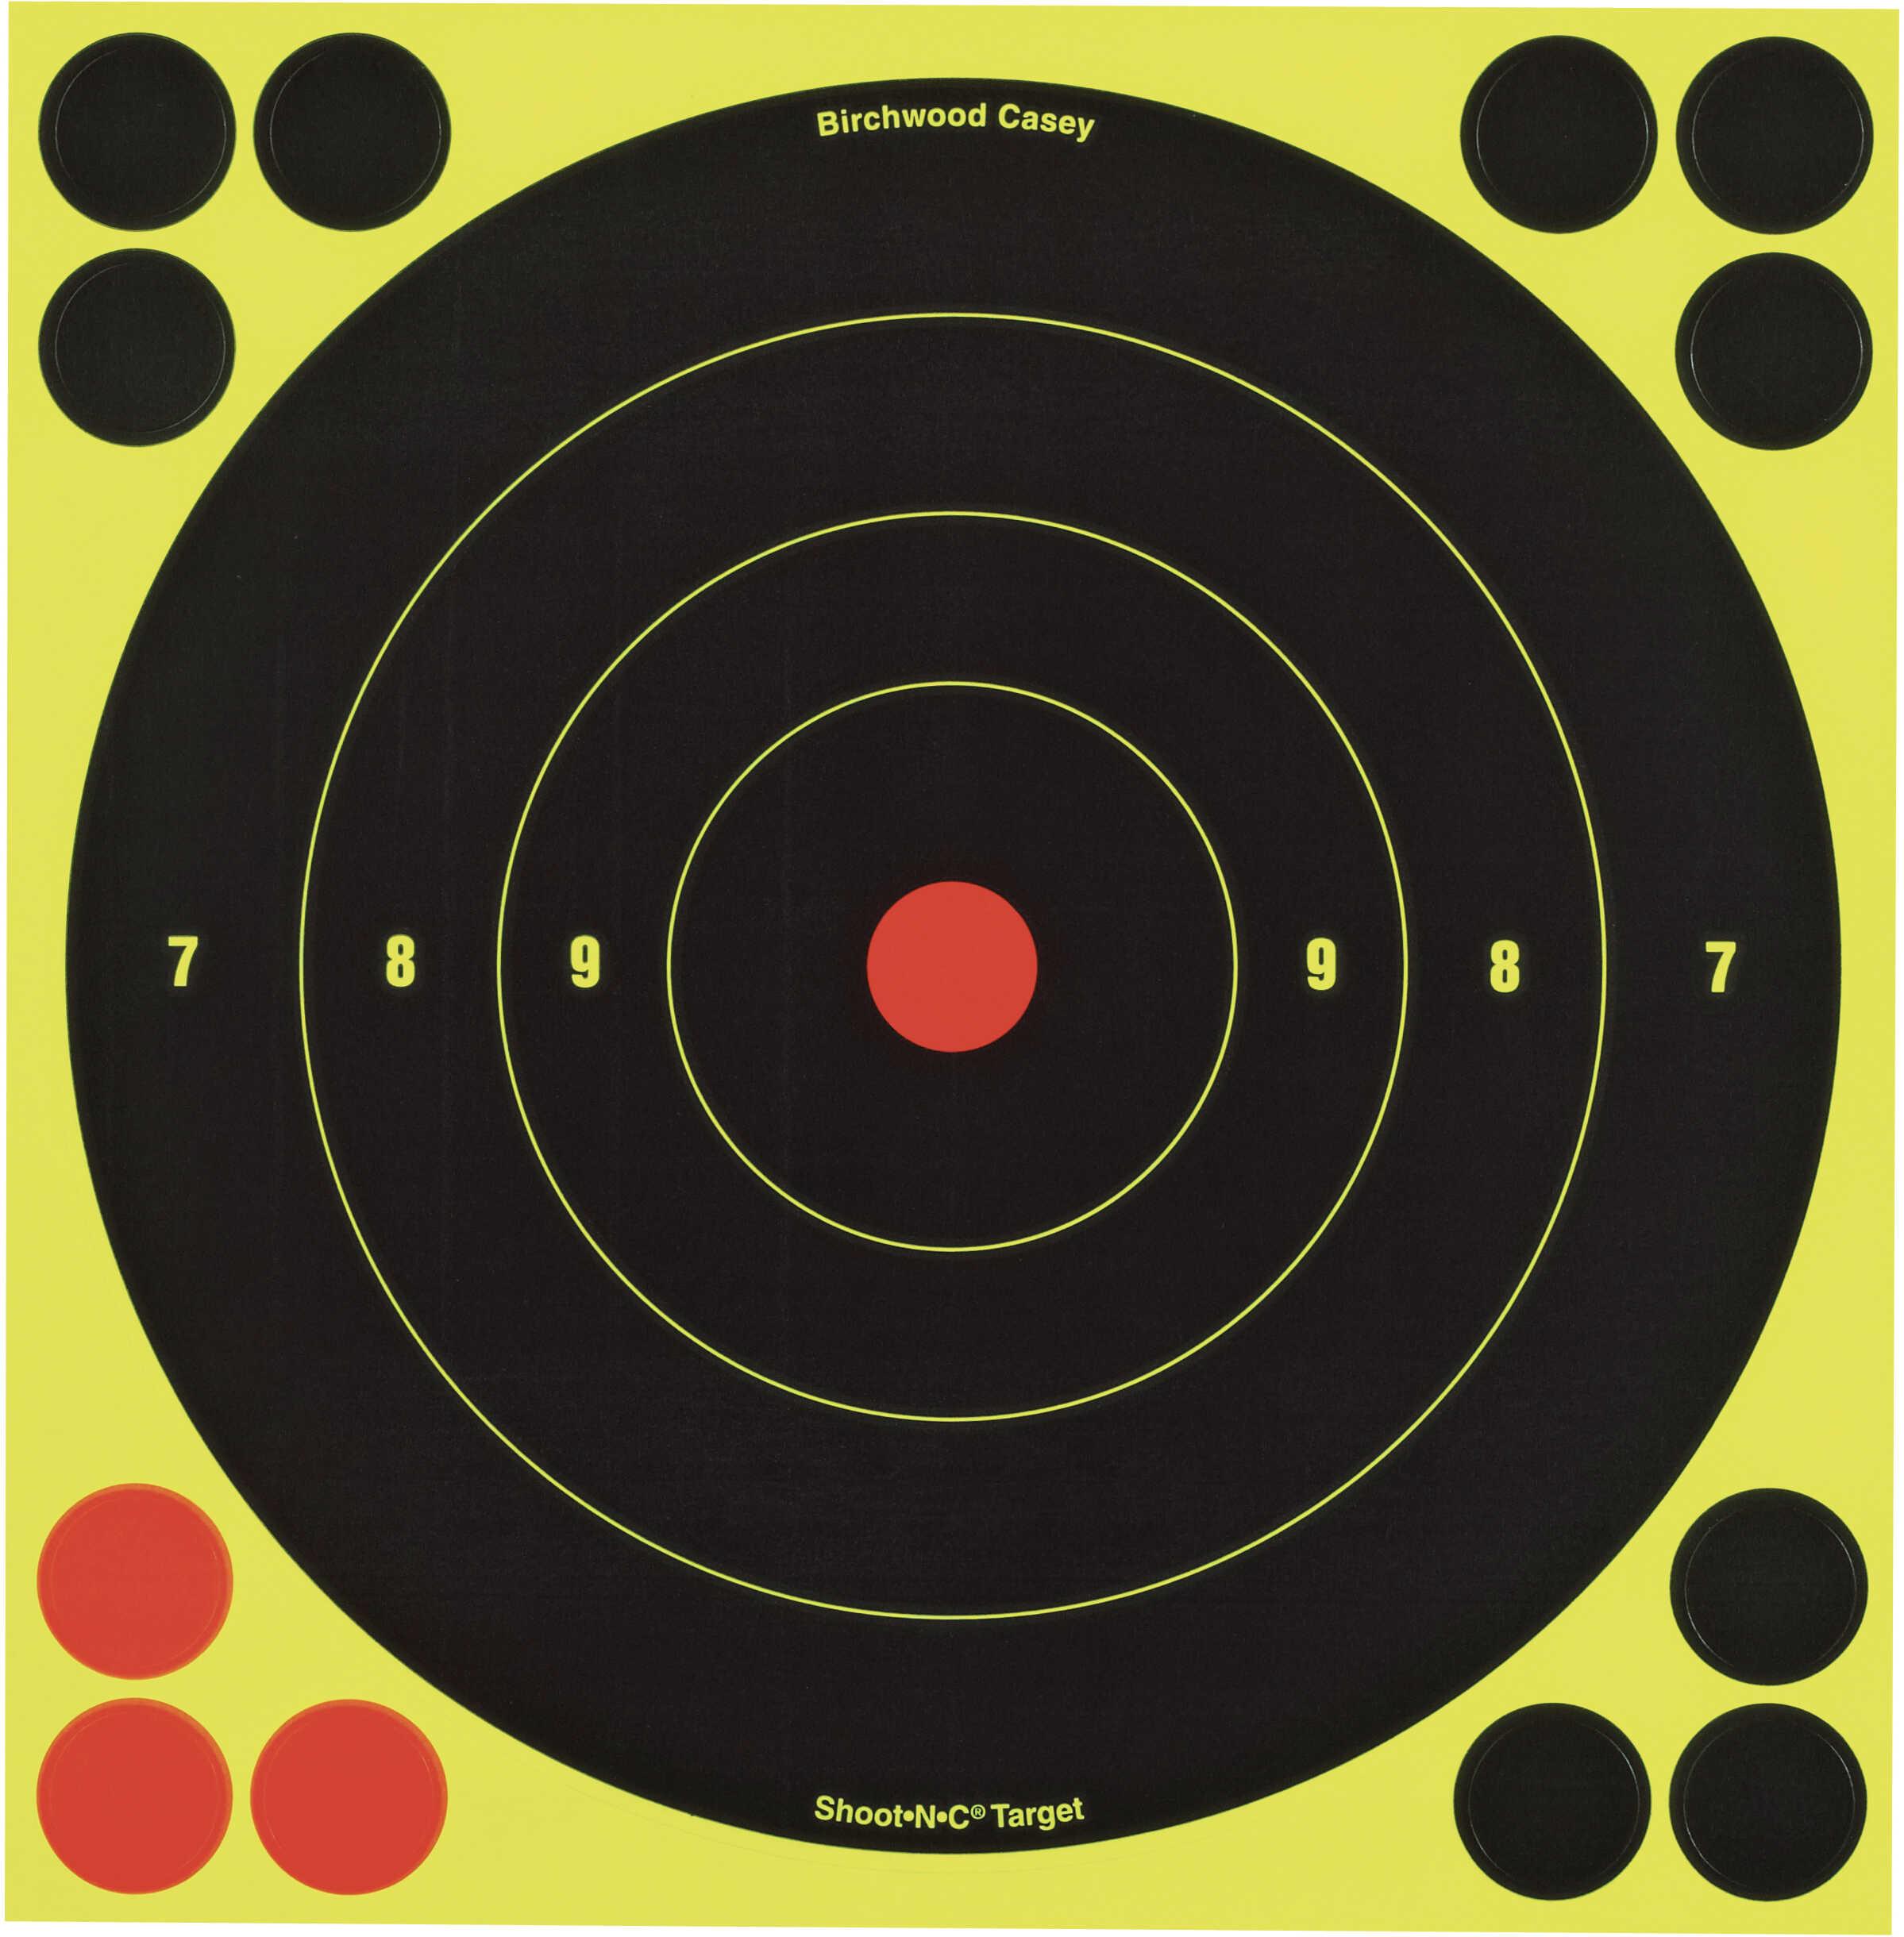 "Birchwood Casey Shoot-N-C Targets: Bull's-Eye 8"" Round Target (Per 6) 34805"